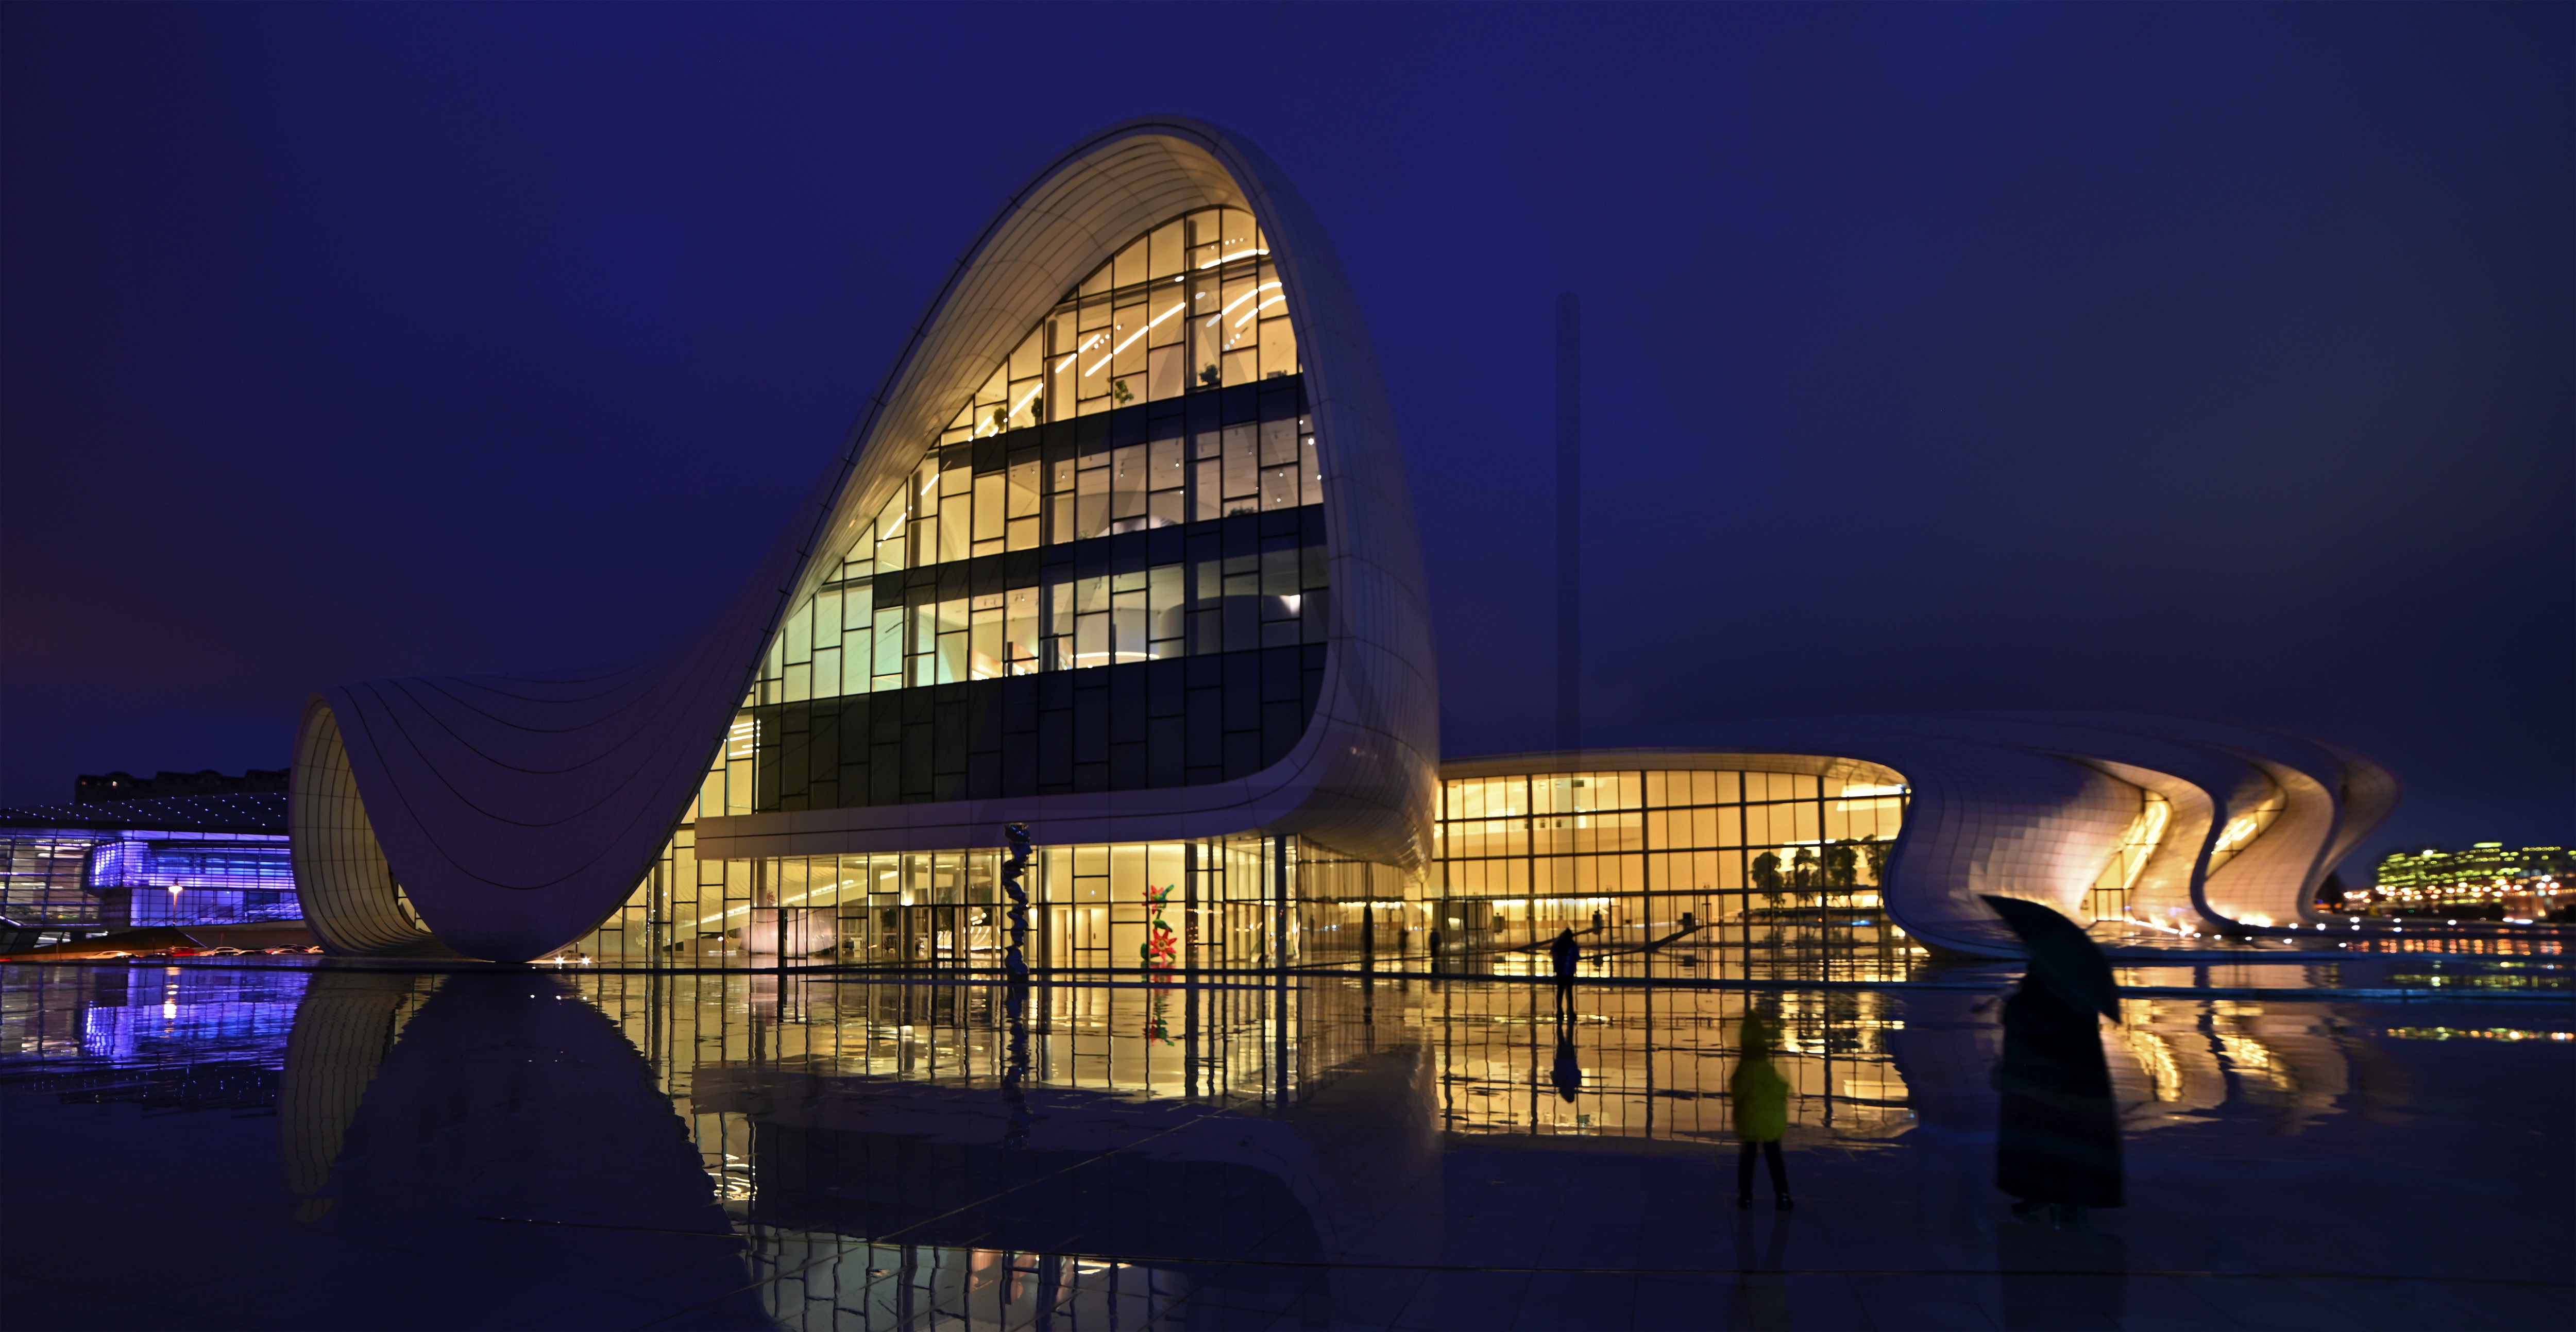 <i>Heydar Aliyev Center, Baku (Azerbaijan)<i>